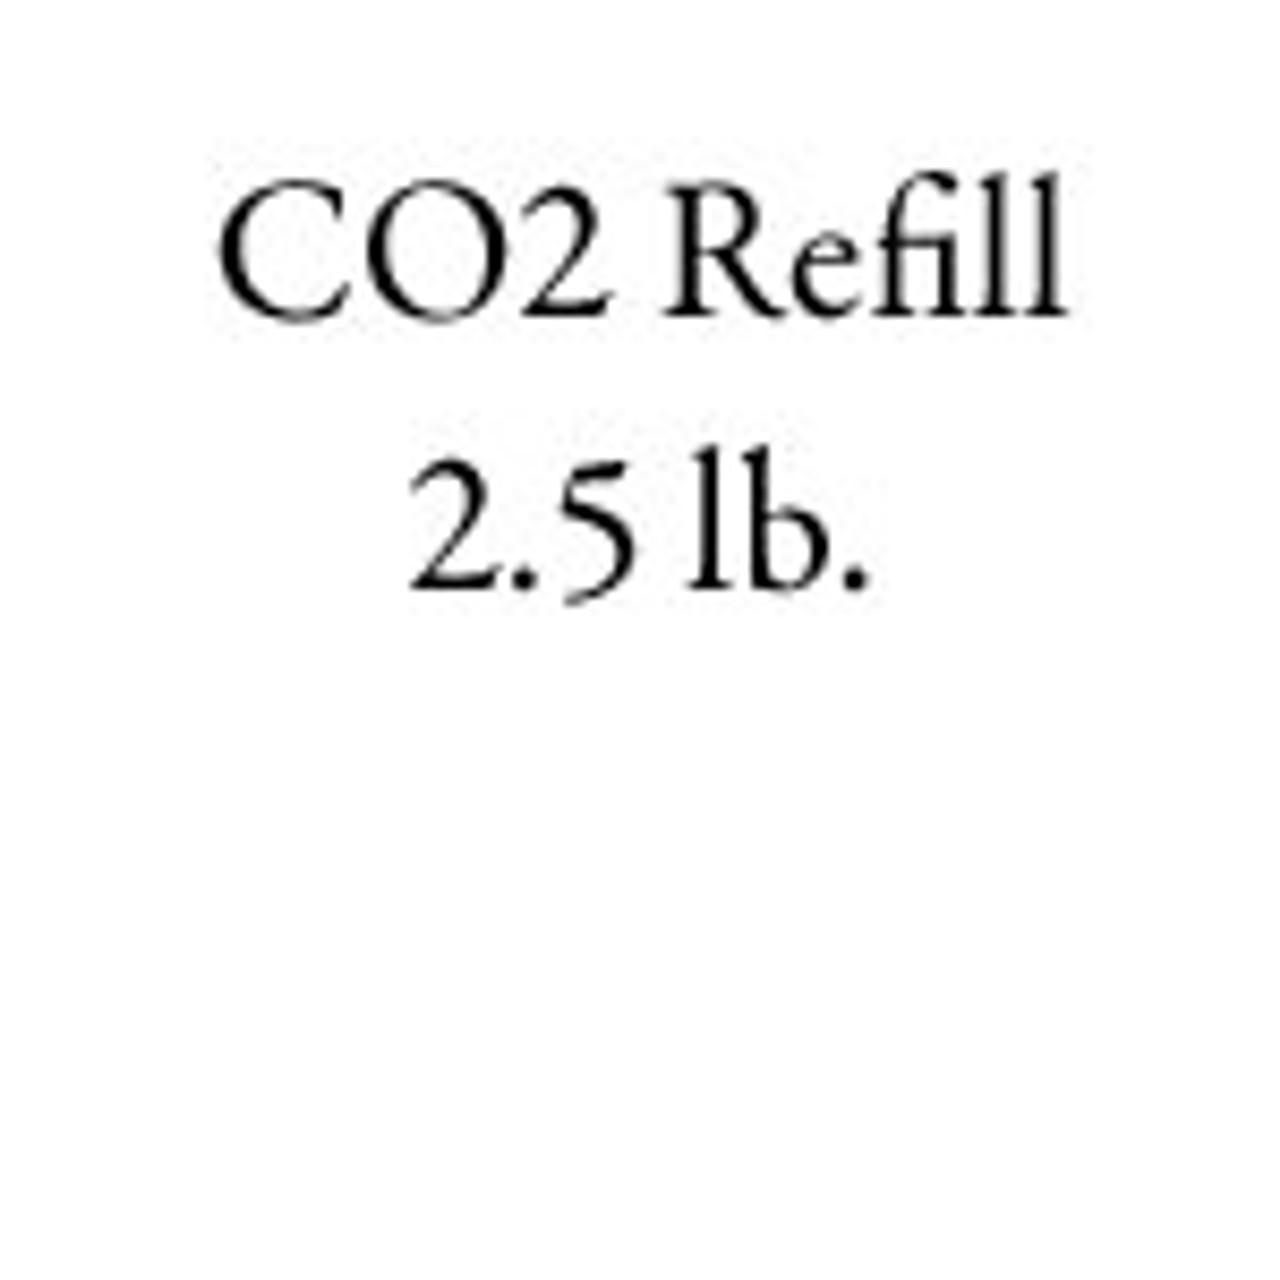 CO2 Refill 2 5 lb